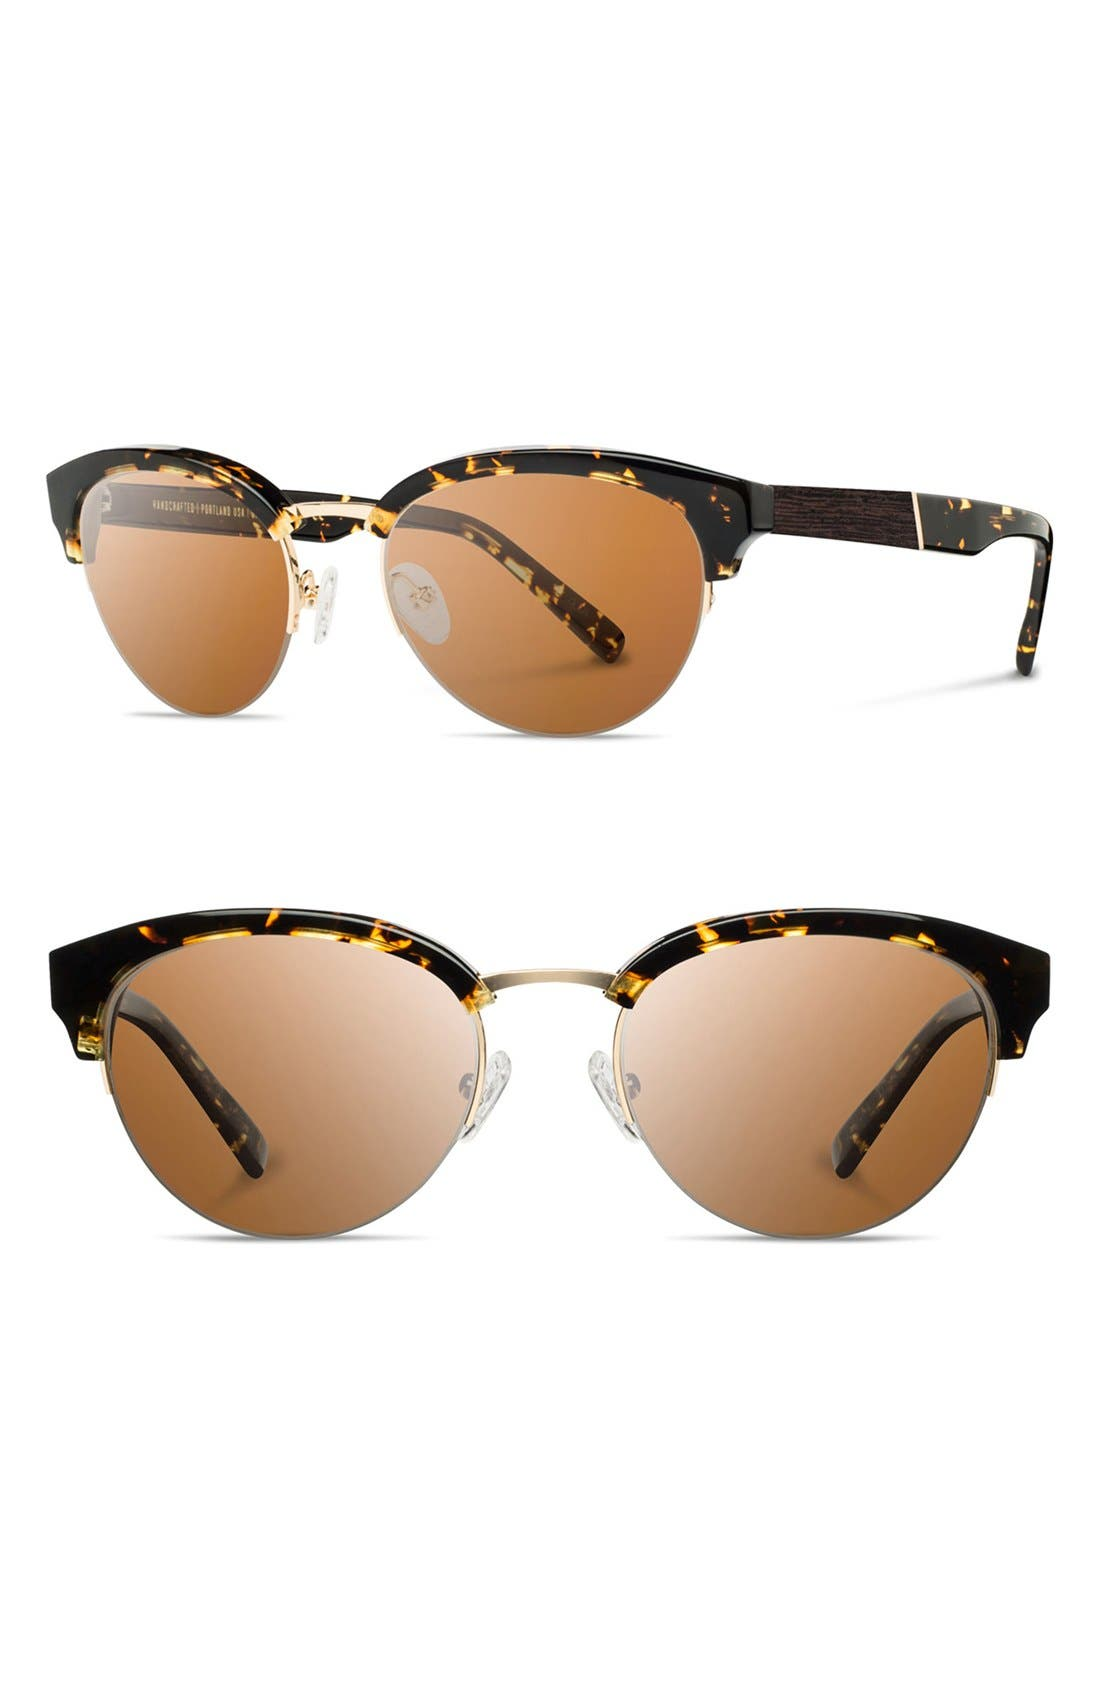 'Hayden' 53mm Acetate & Wood Sunglasses,                             Main thumbnail 1, color,                             Dark Speckle/ Gold/ Brown